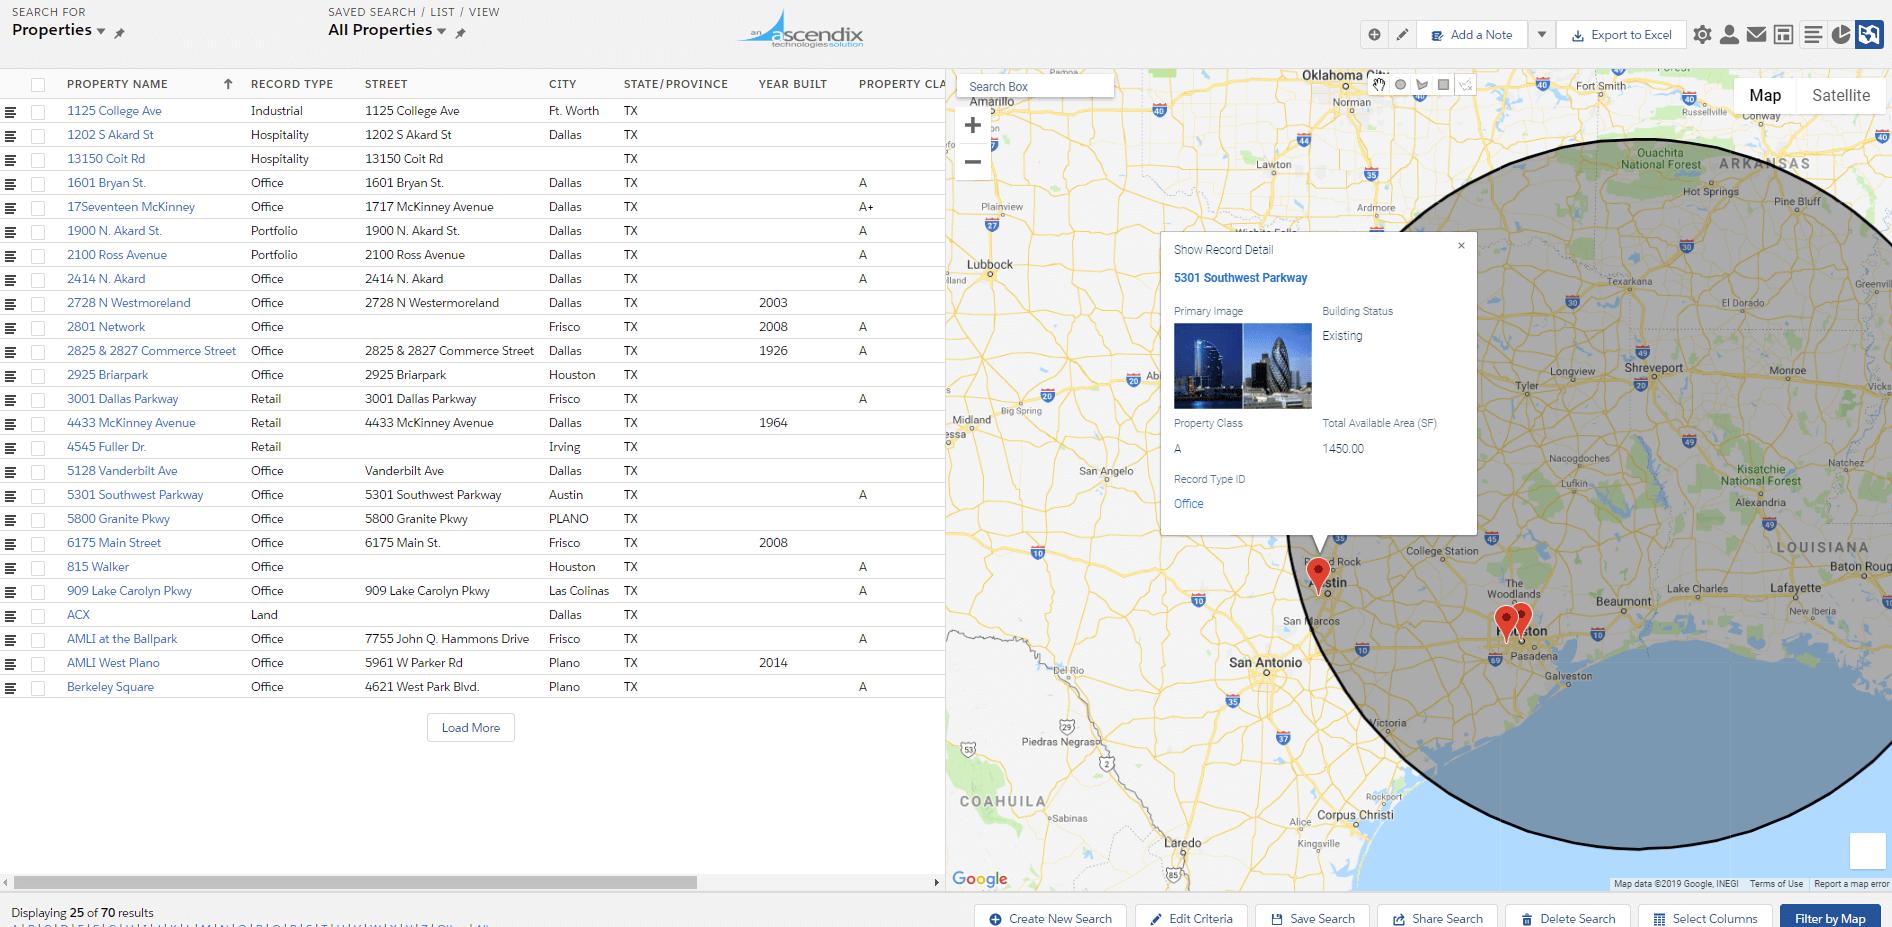 Ascendix-Search-google-maps-configuration